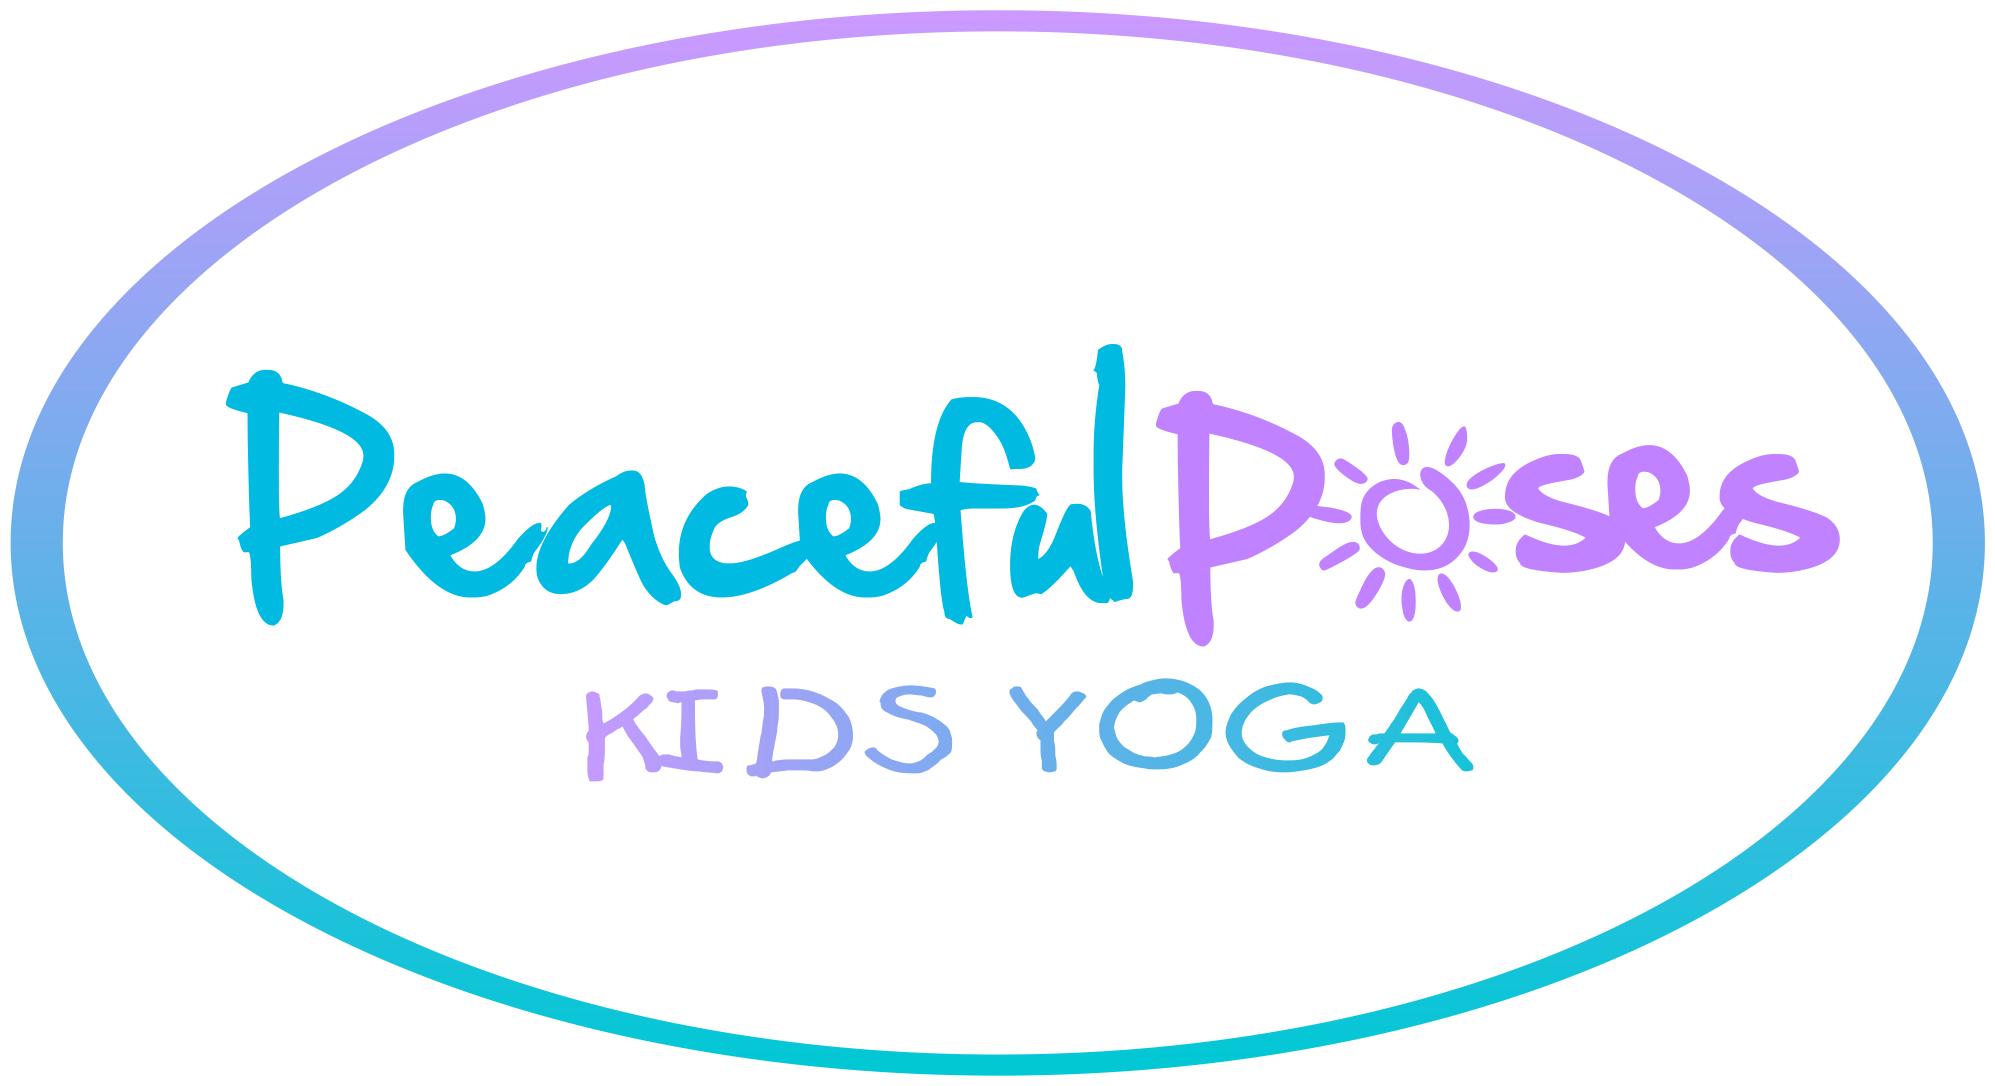 Peaceful Poses Kids Yoga